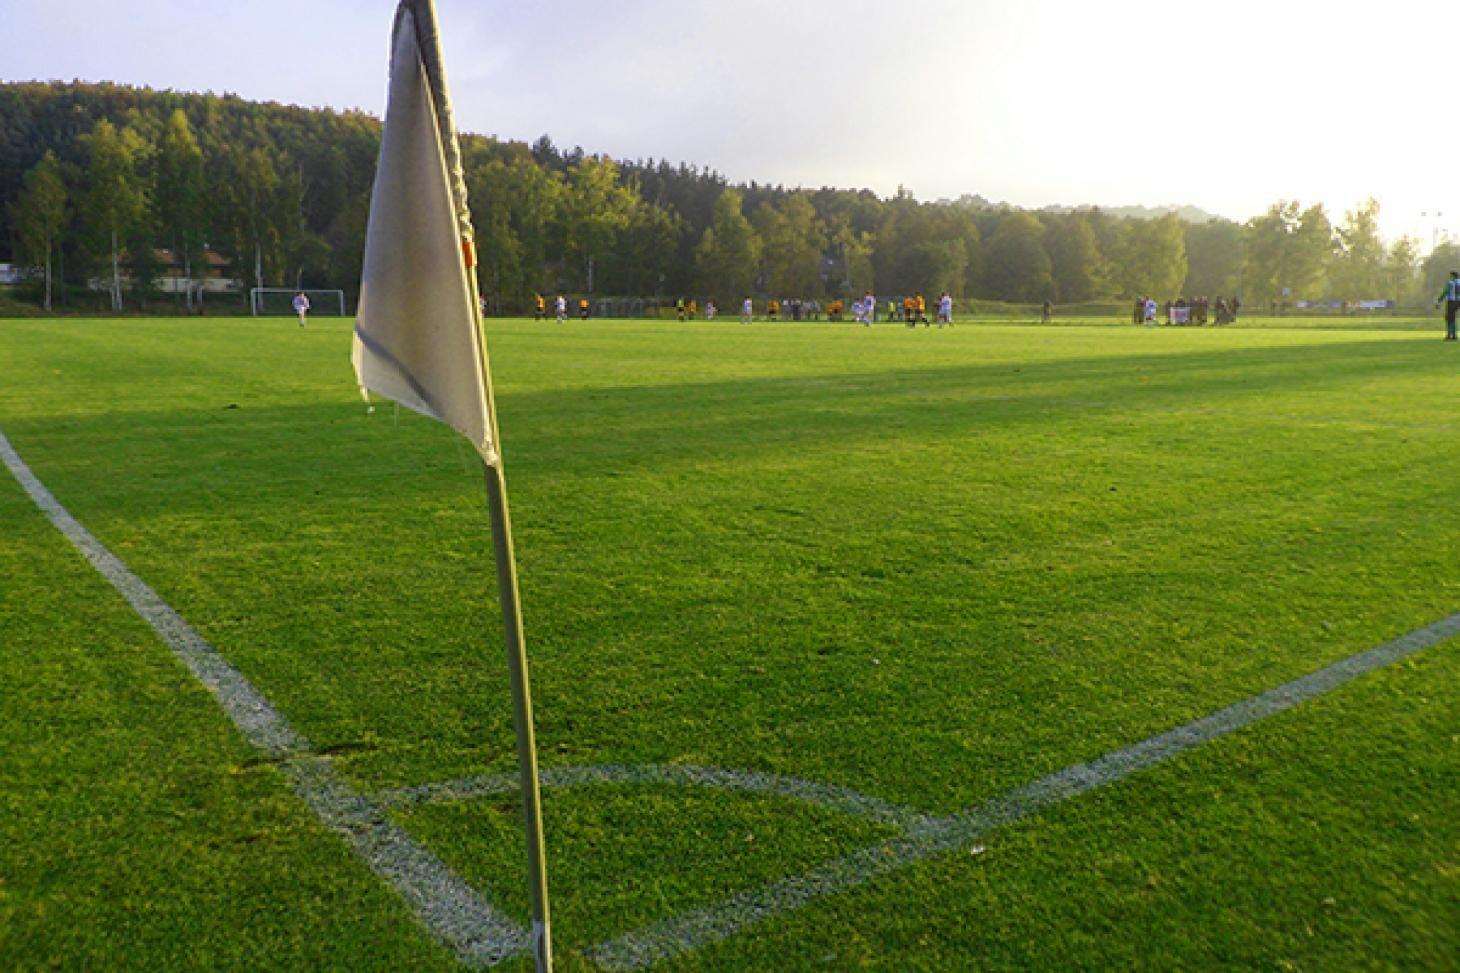 Gurnell Leisure Centre 5 a side | Grass football pitch